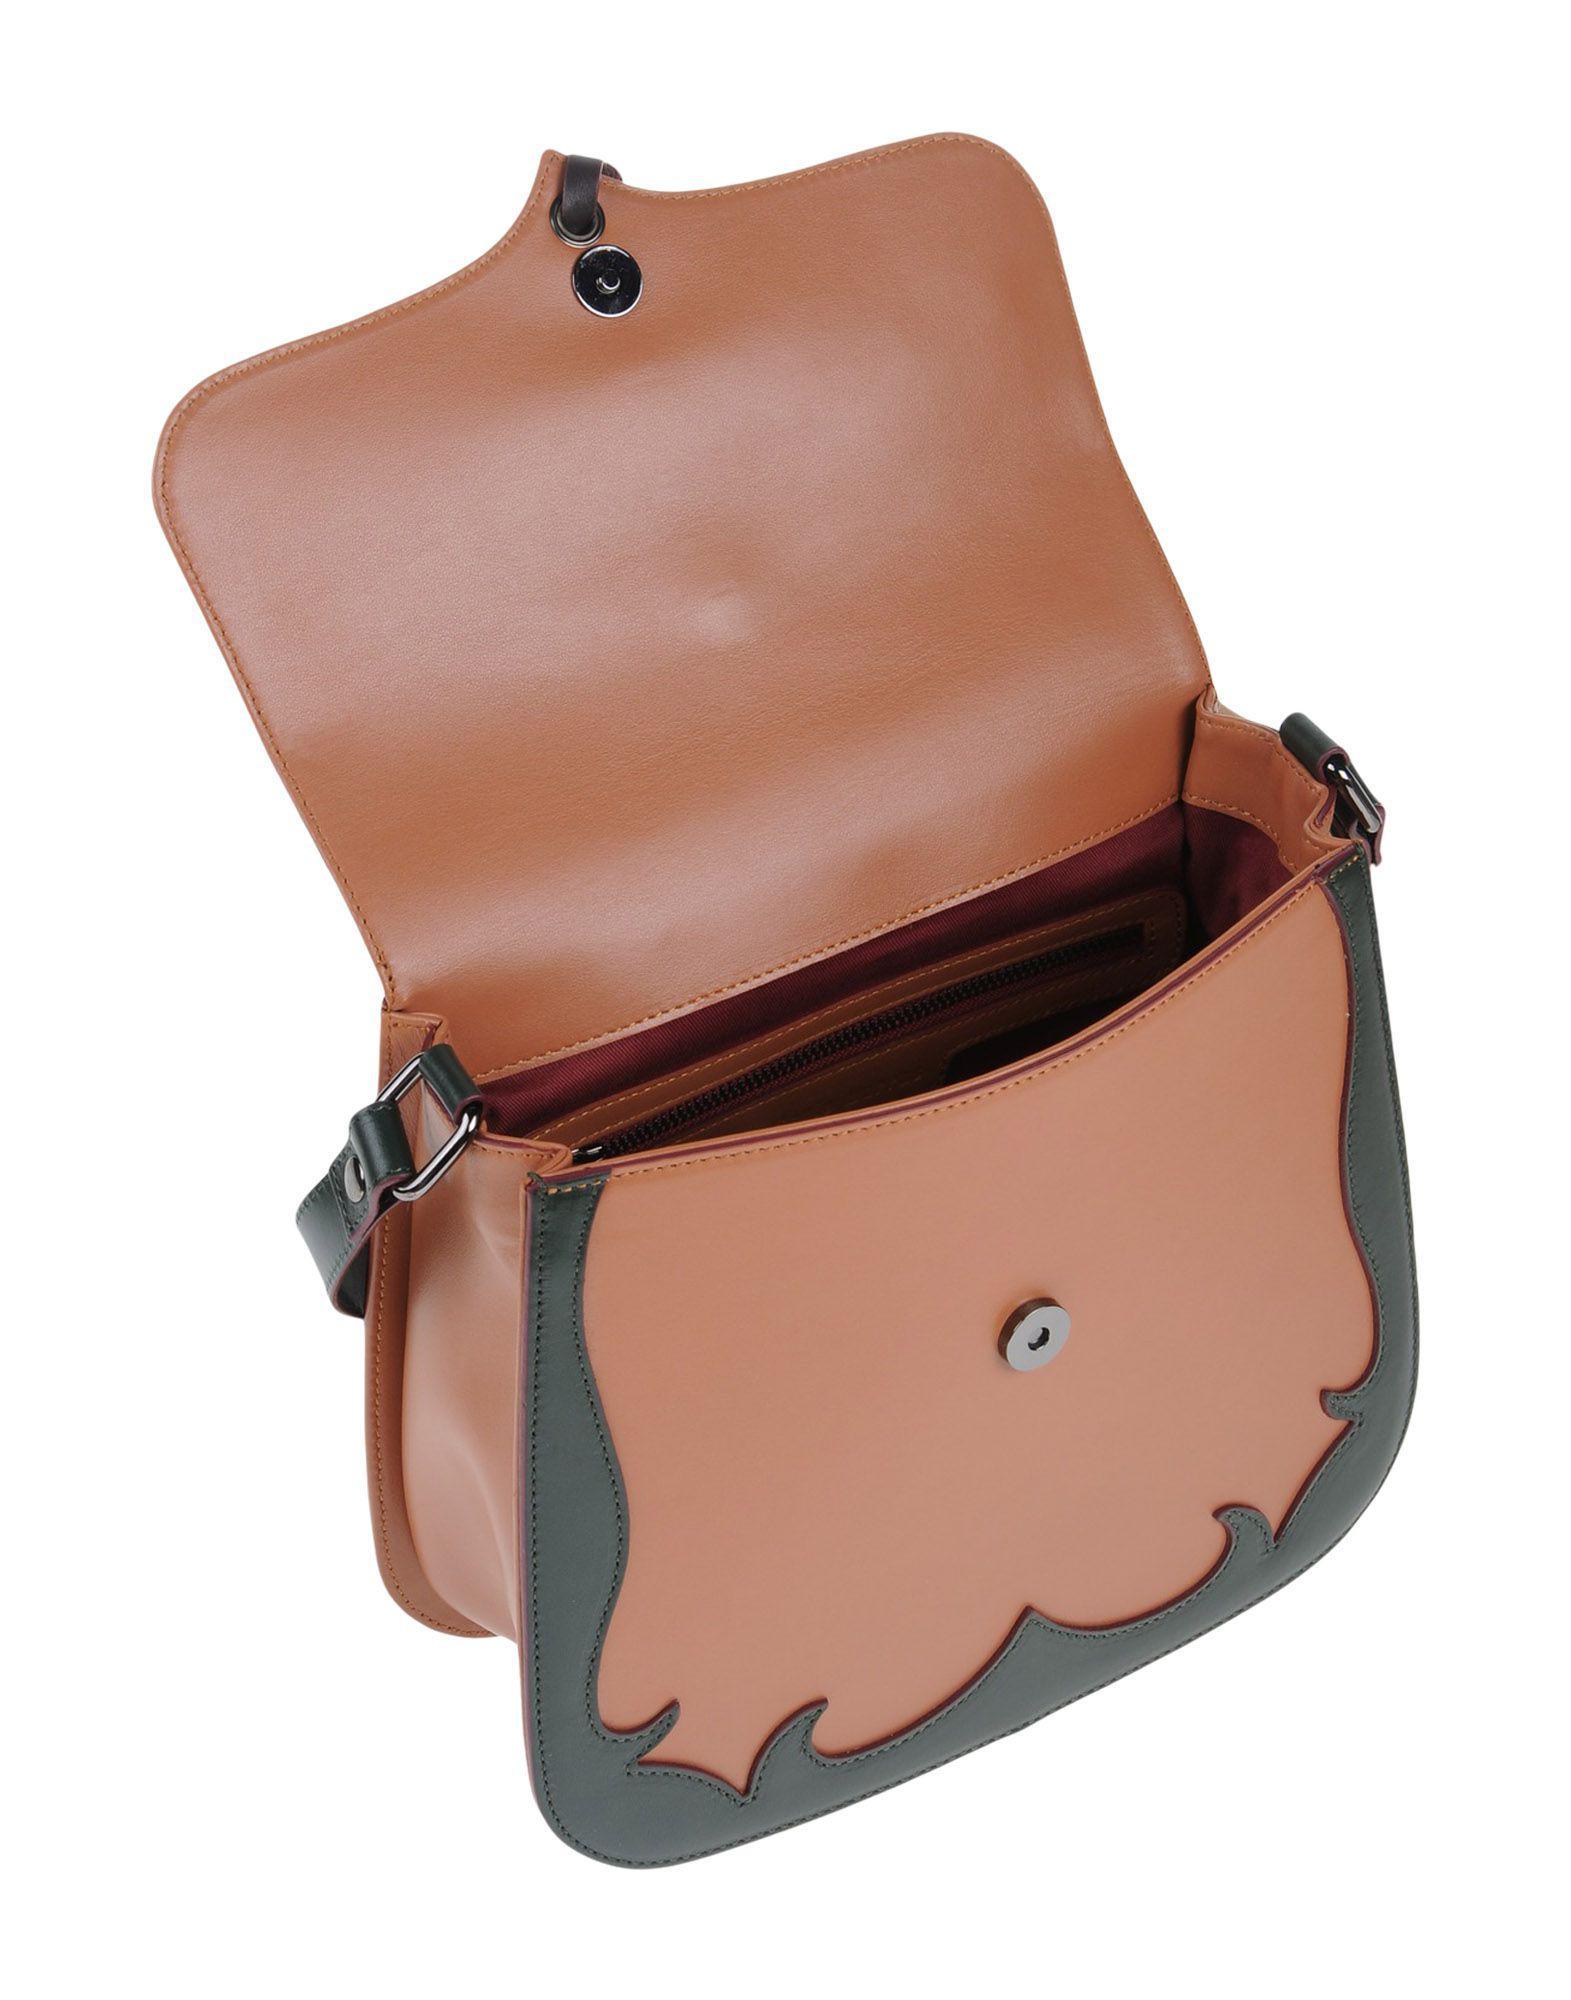 Antonio Marras Leather Cross-body Bag in Brown